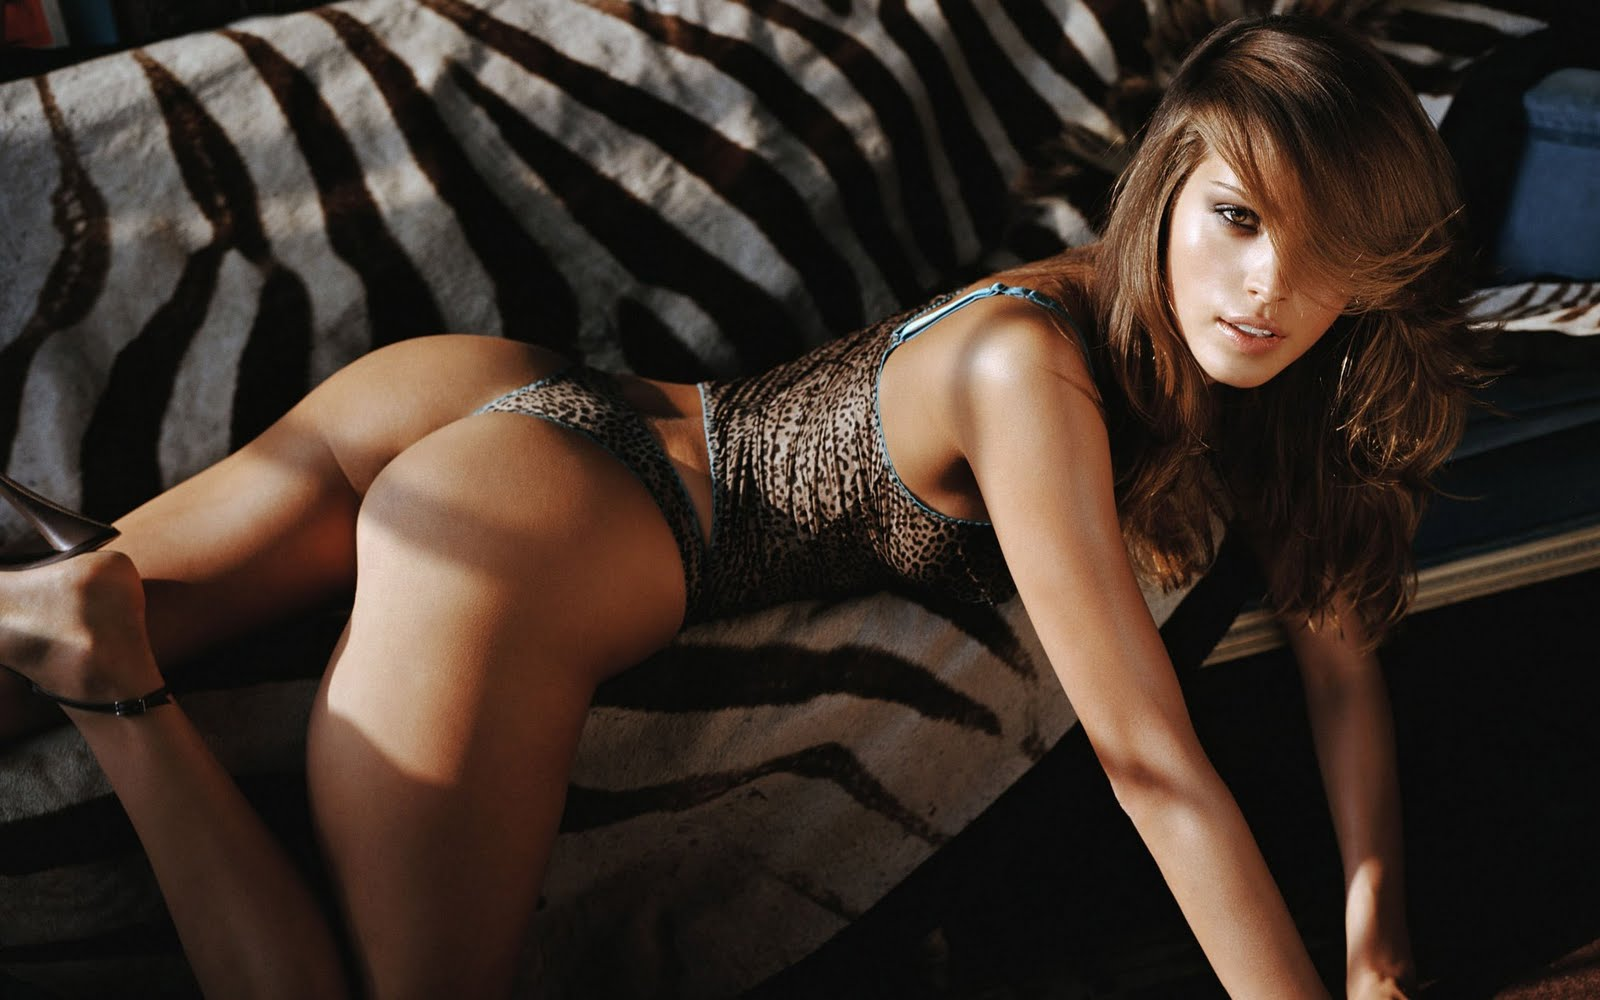 http://2.bp.blogspot.com/_IwRqx_H611g/TOAW_0tw2XI/AAAAAAAABRc/RHT8beRoR-Y/s1600/petra_nemcova_hd_widescreen_wallpapers_1920x1200.jpeg